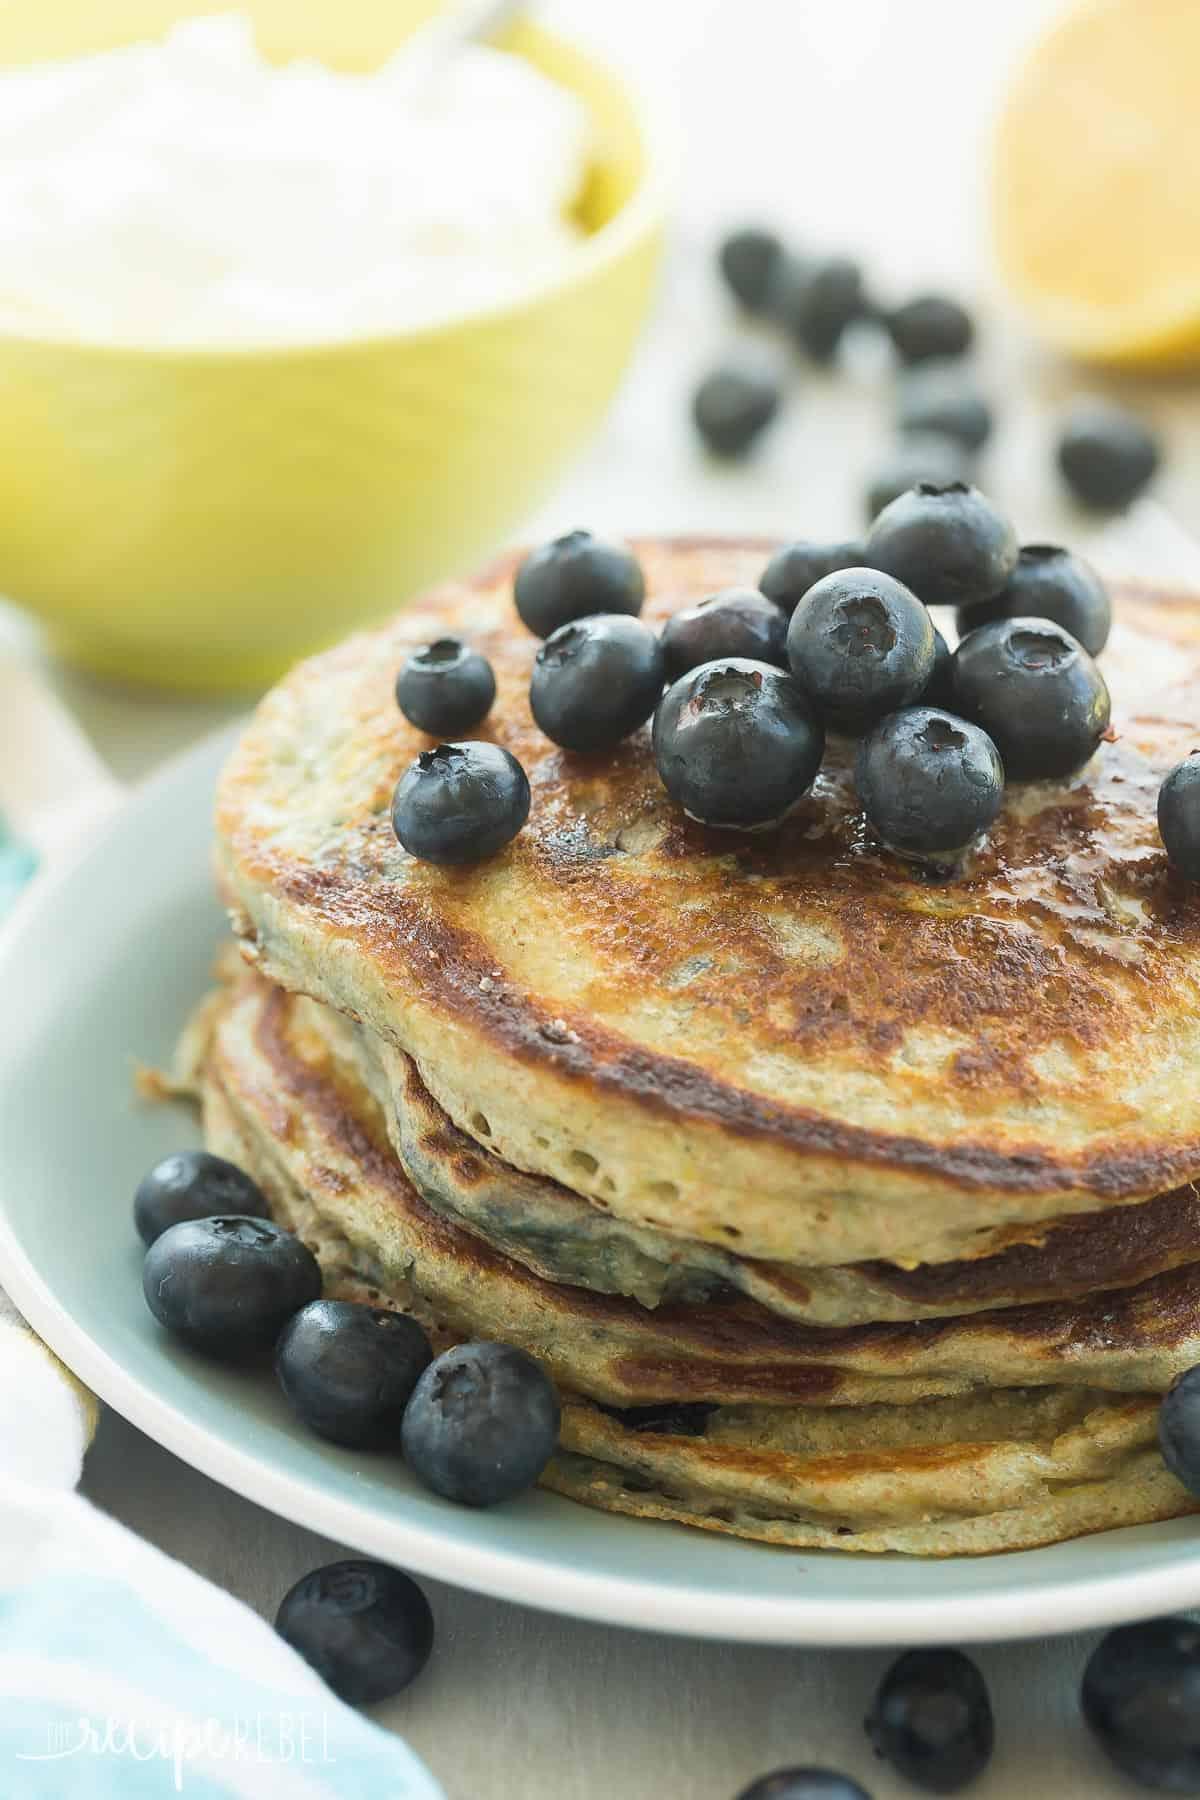 Lemon Blueberry Greek Yogurt Pancakes // The Recipe Rebel